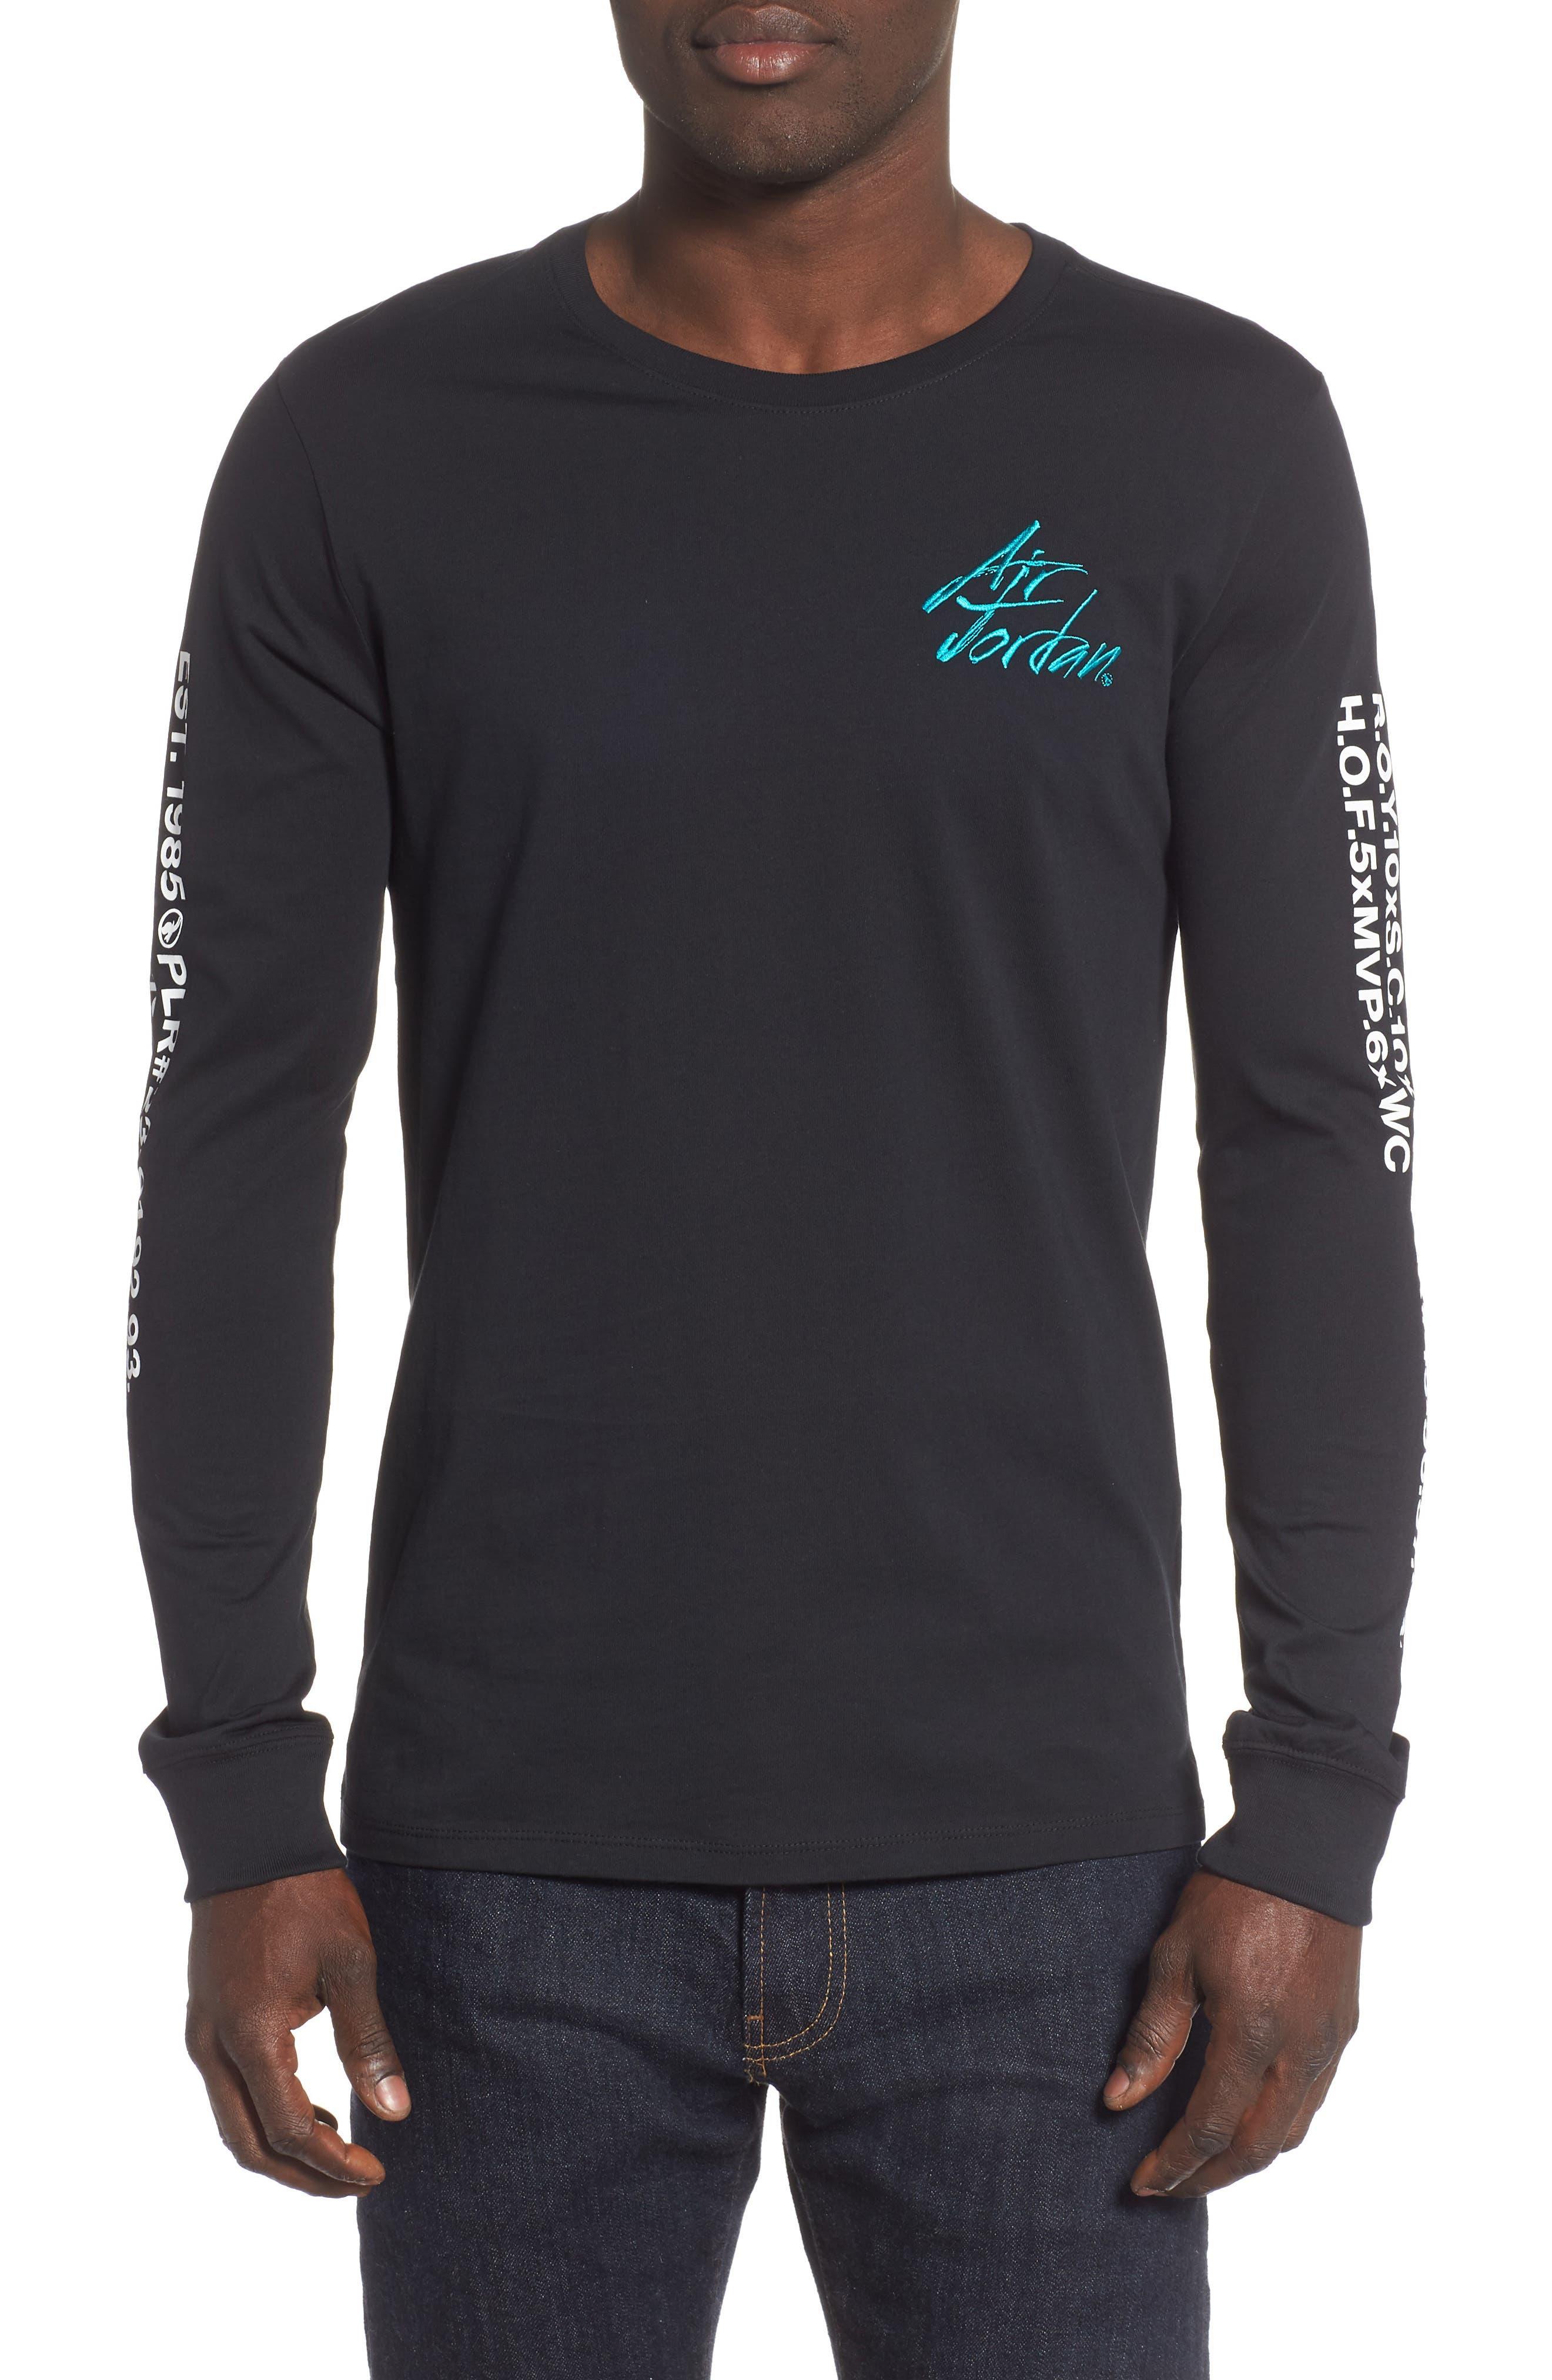 Nike Jordan Jsw Greatest Graphic T-Shirt Black